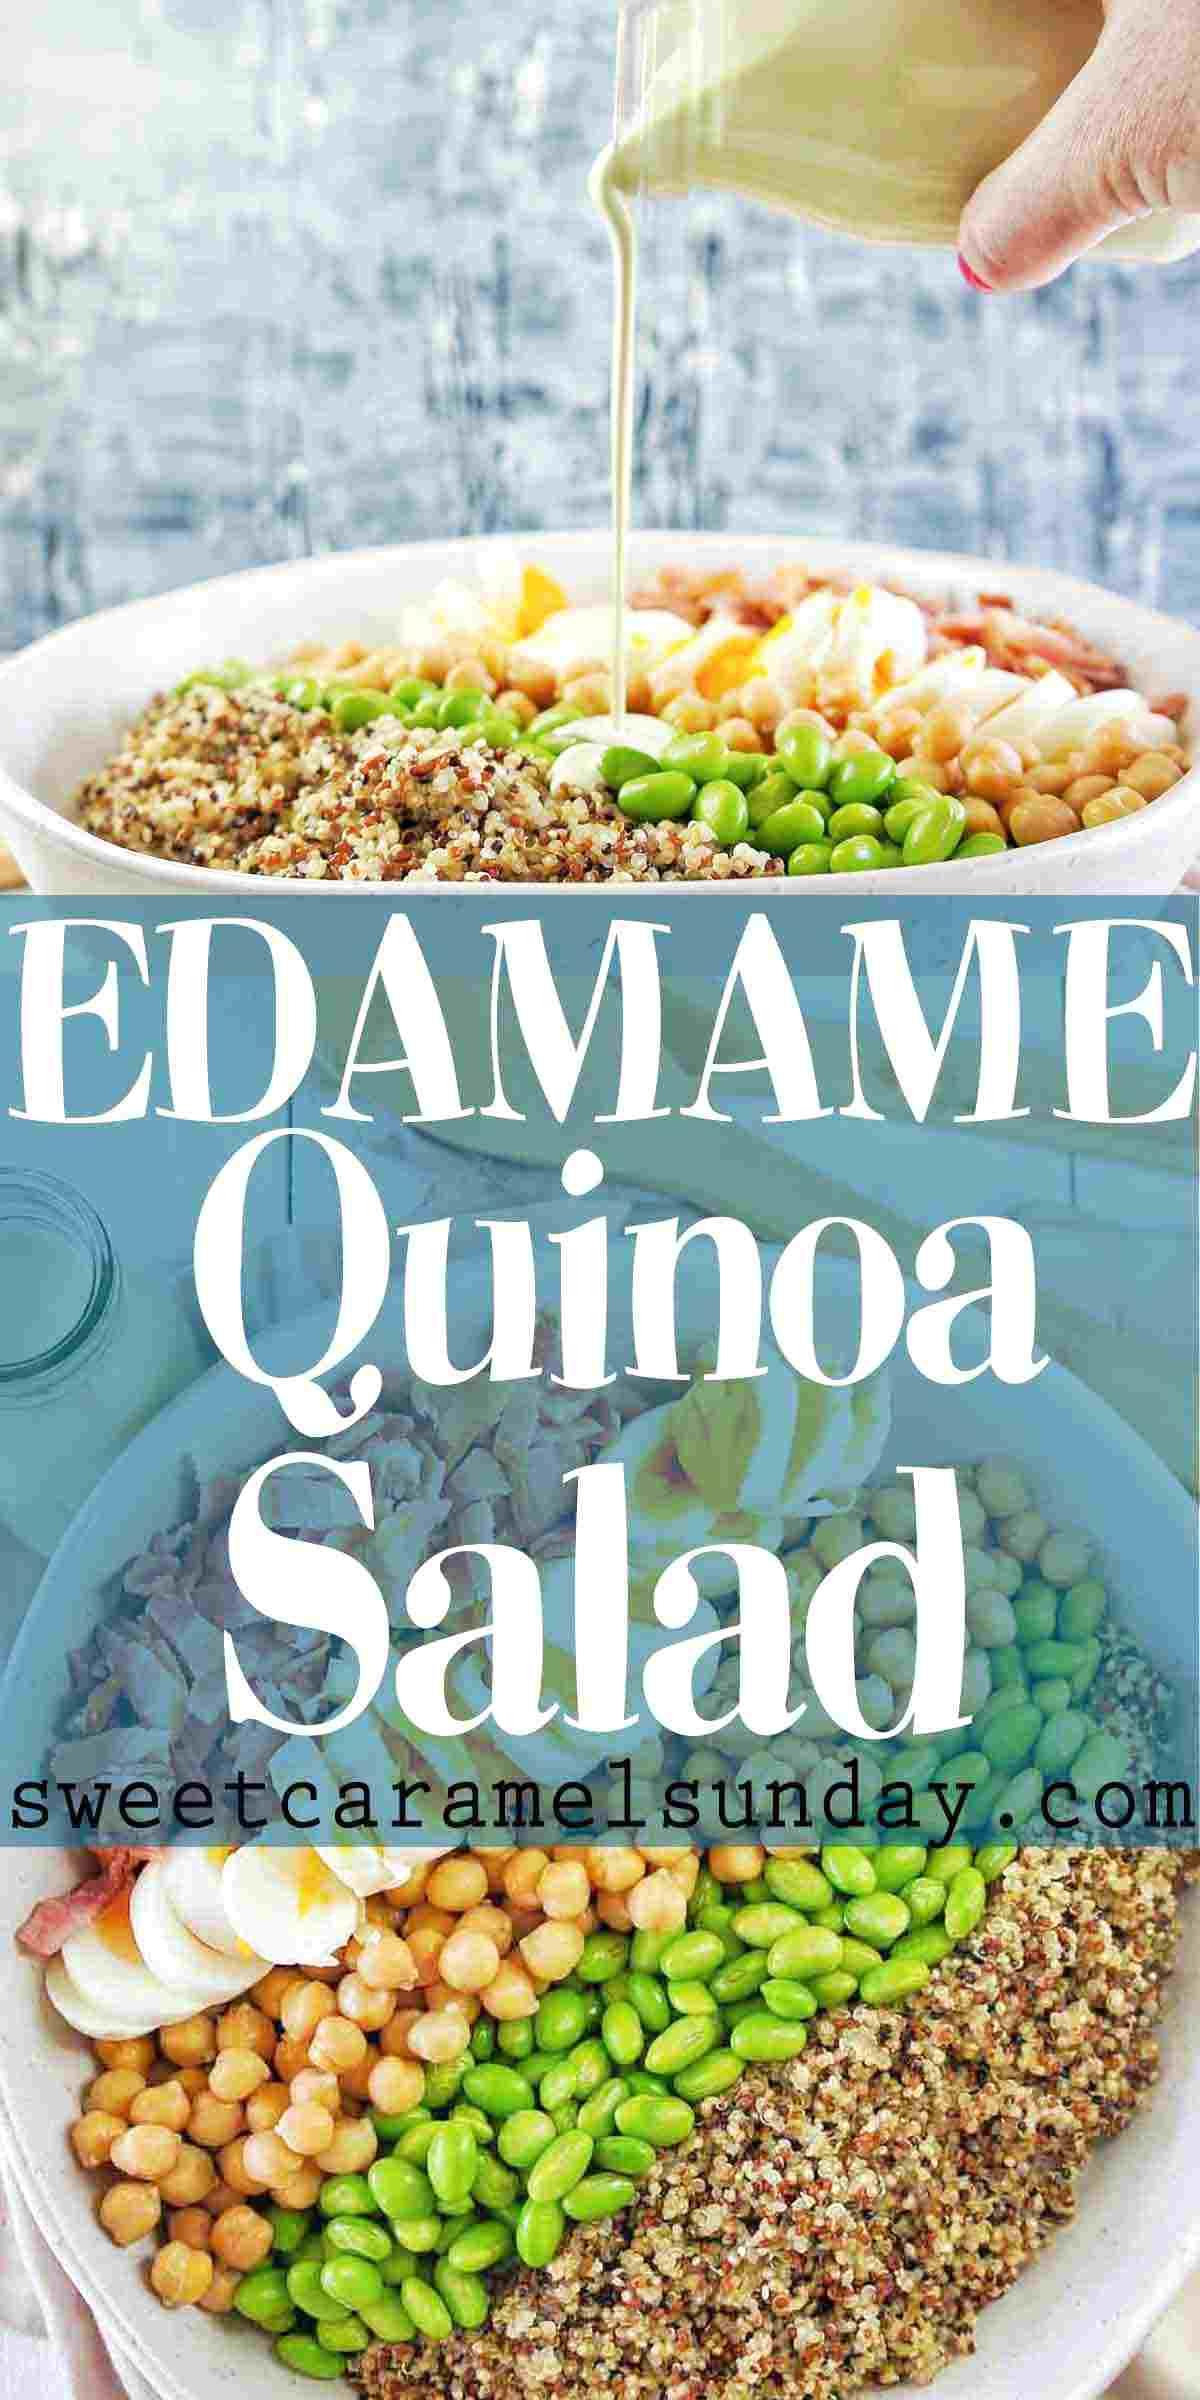 Edamame Quinoa Salad with text overlay